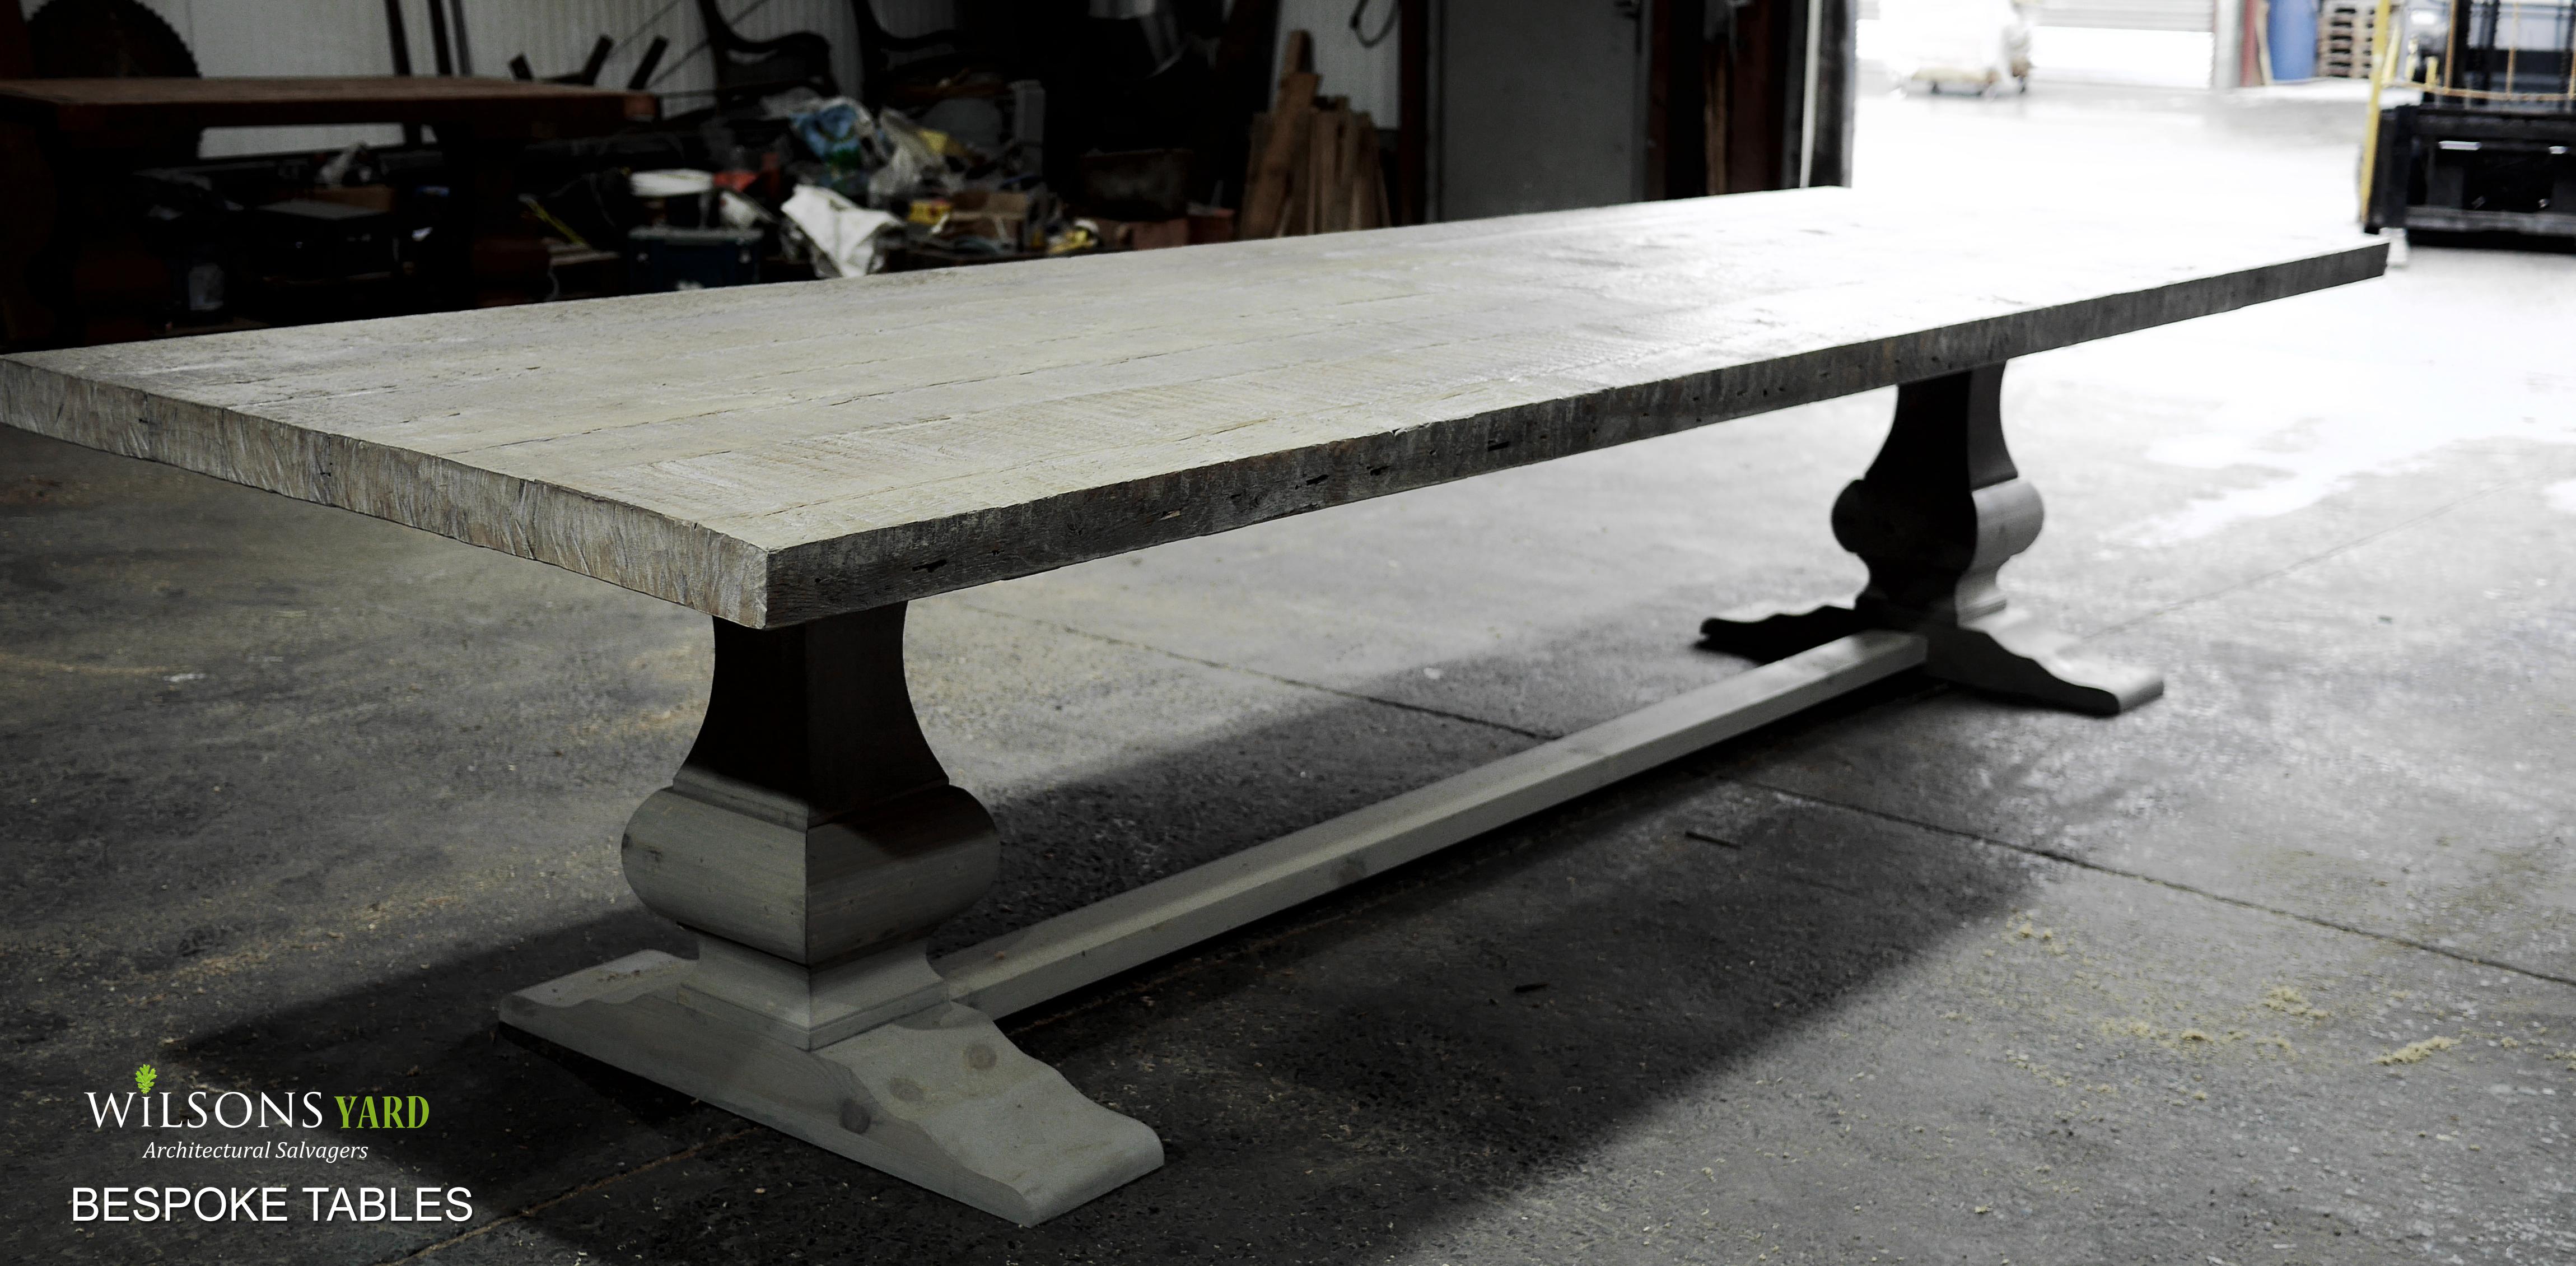 Handmade Bespoke Kitchen Tables